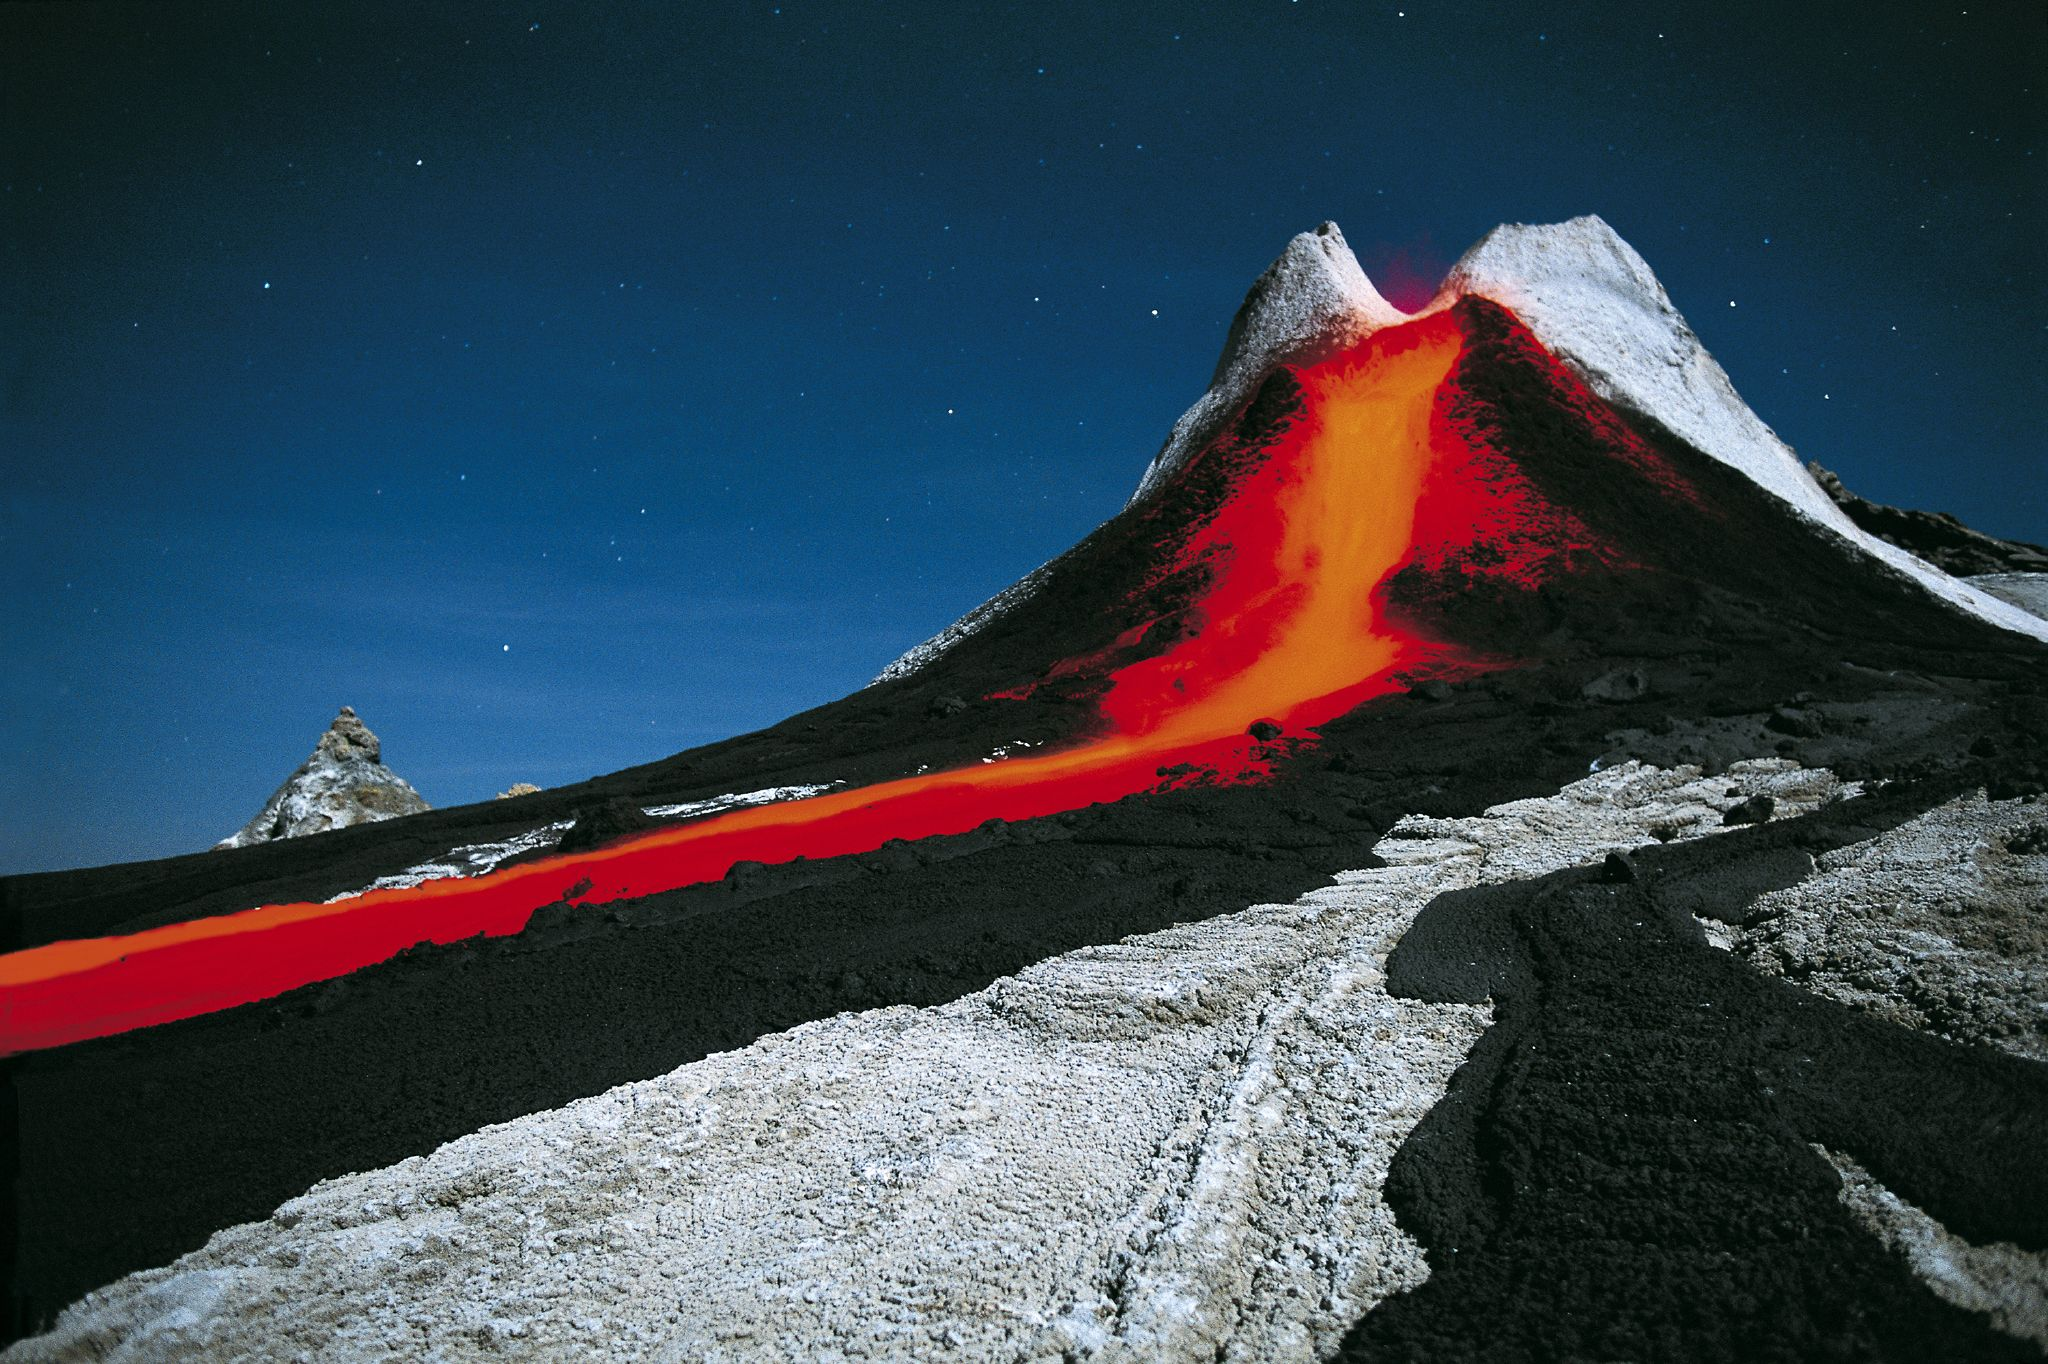 volcano-gallery-10-22-09.jpg